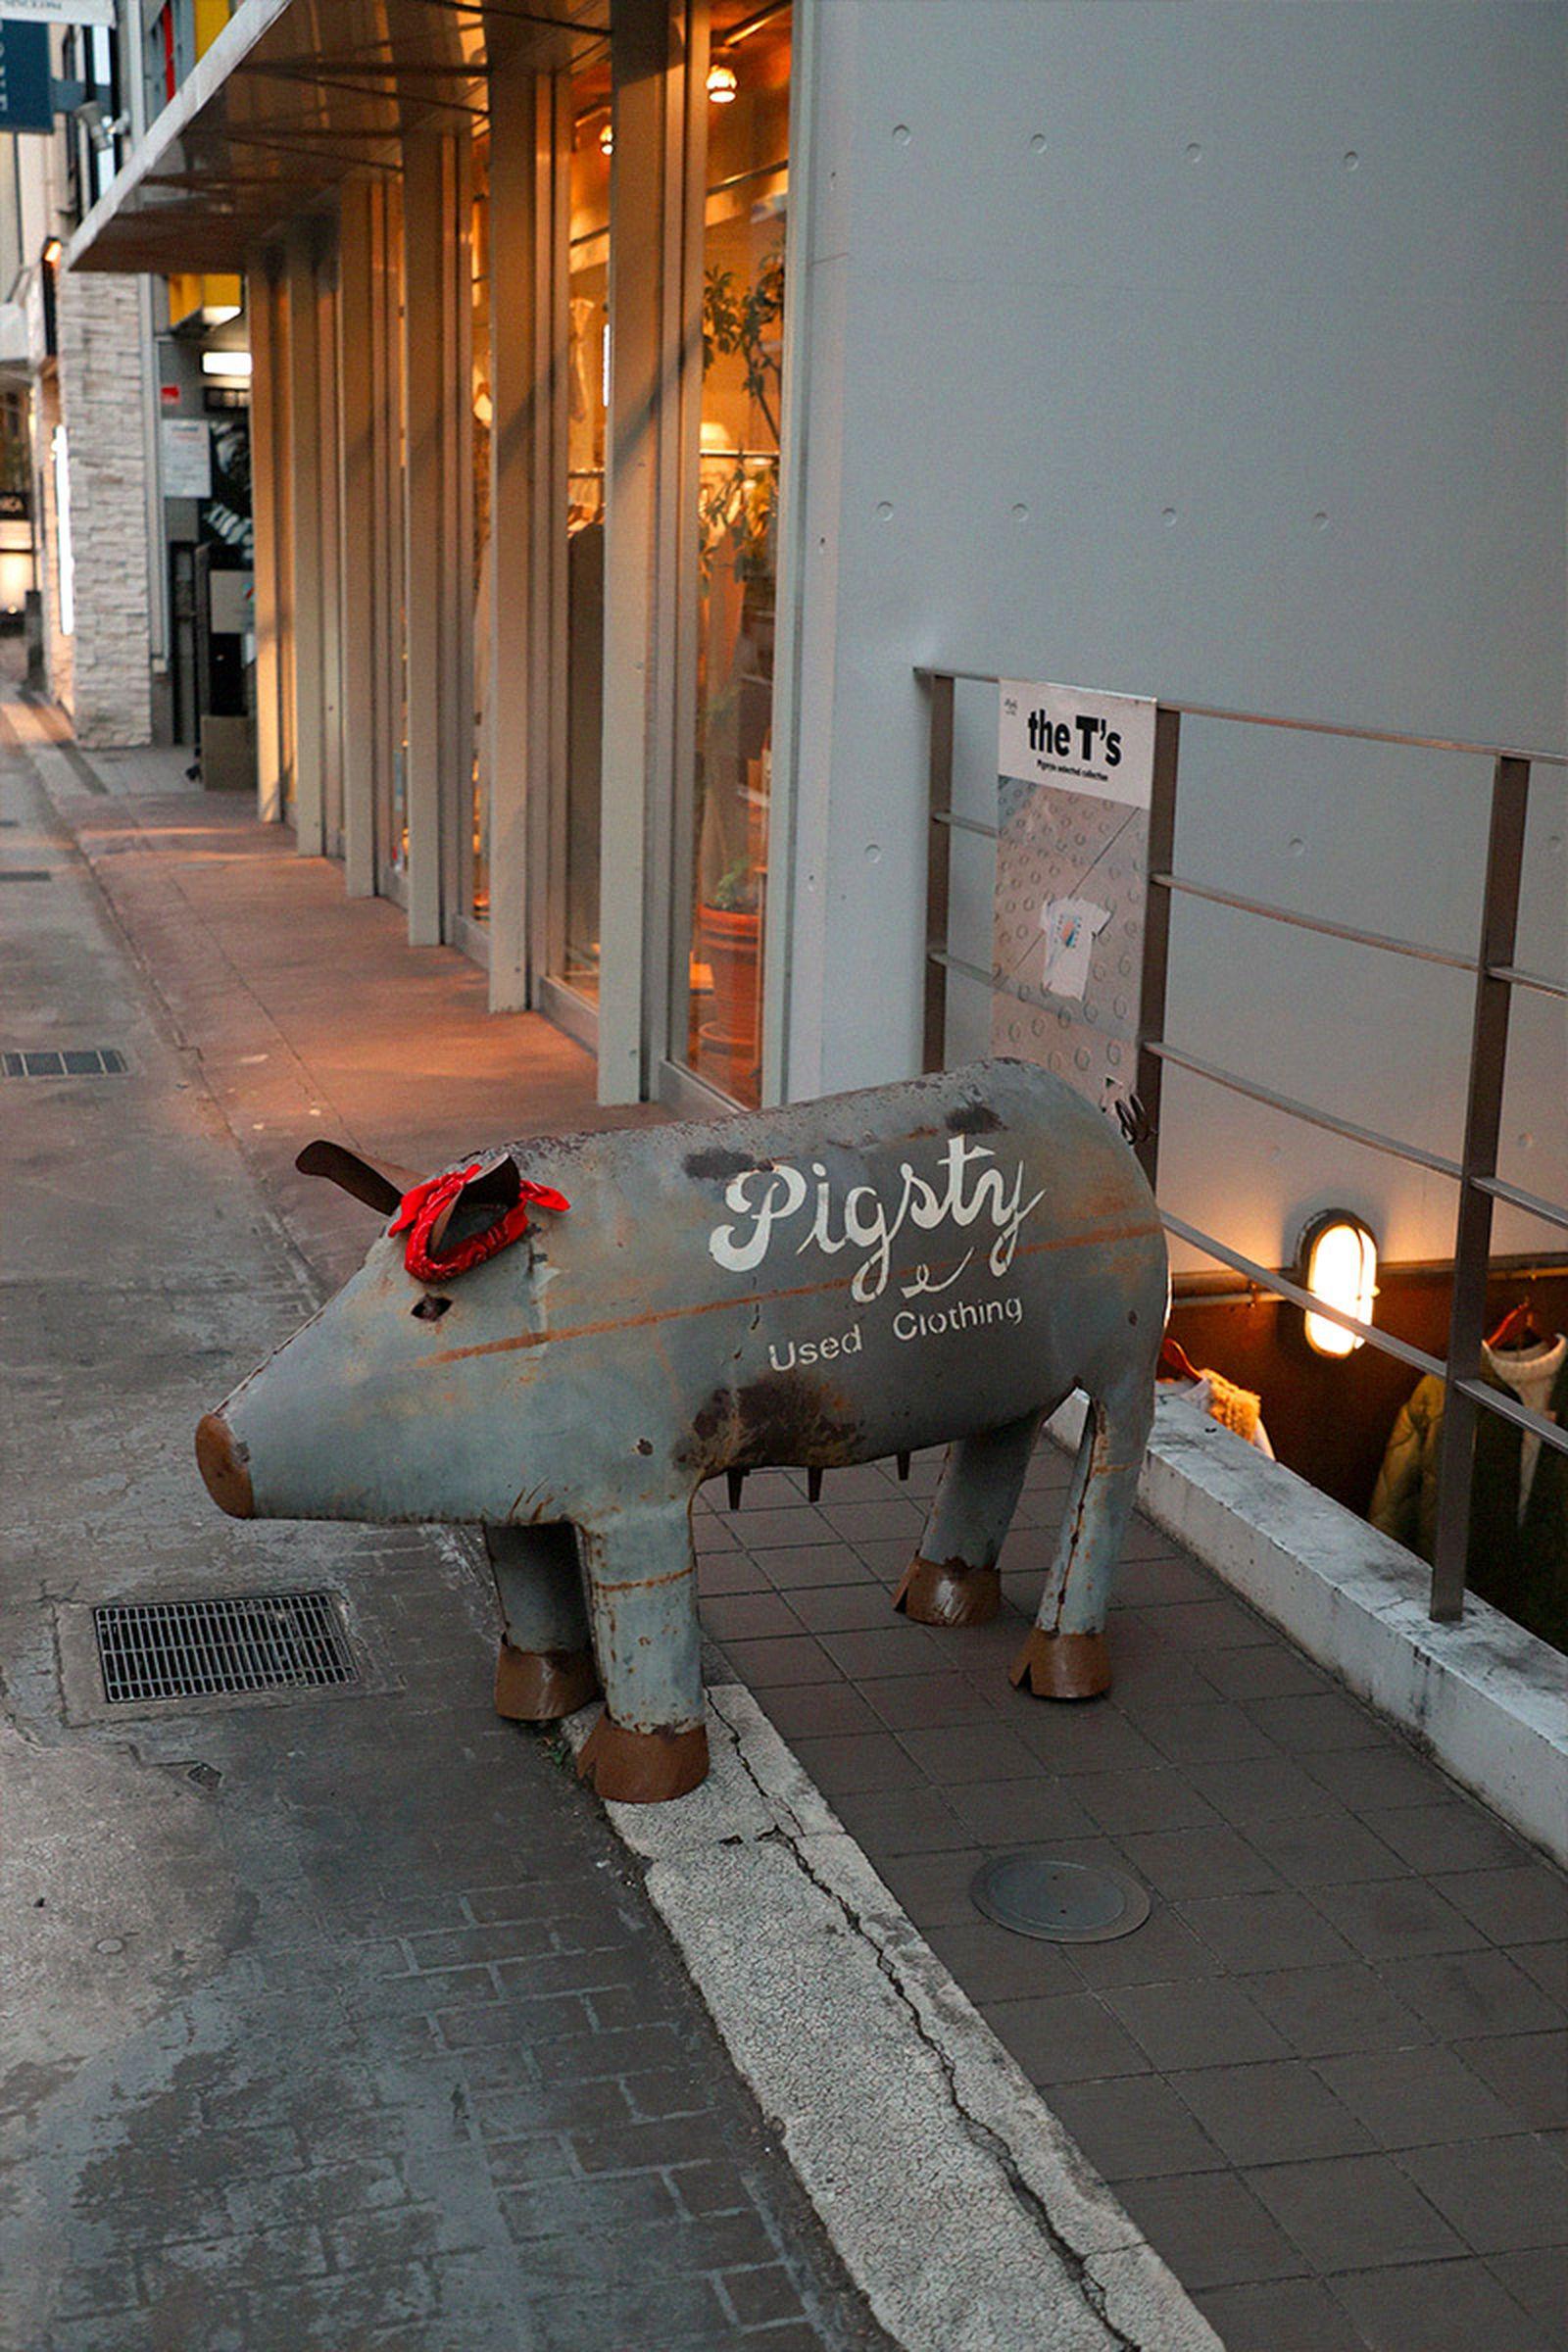 tokyo-best-vintage-store-guide-woolrich-pigsty-01